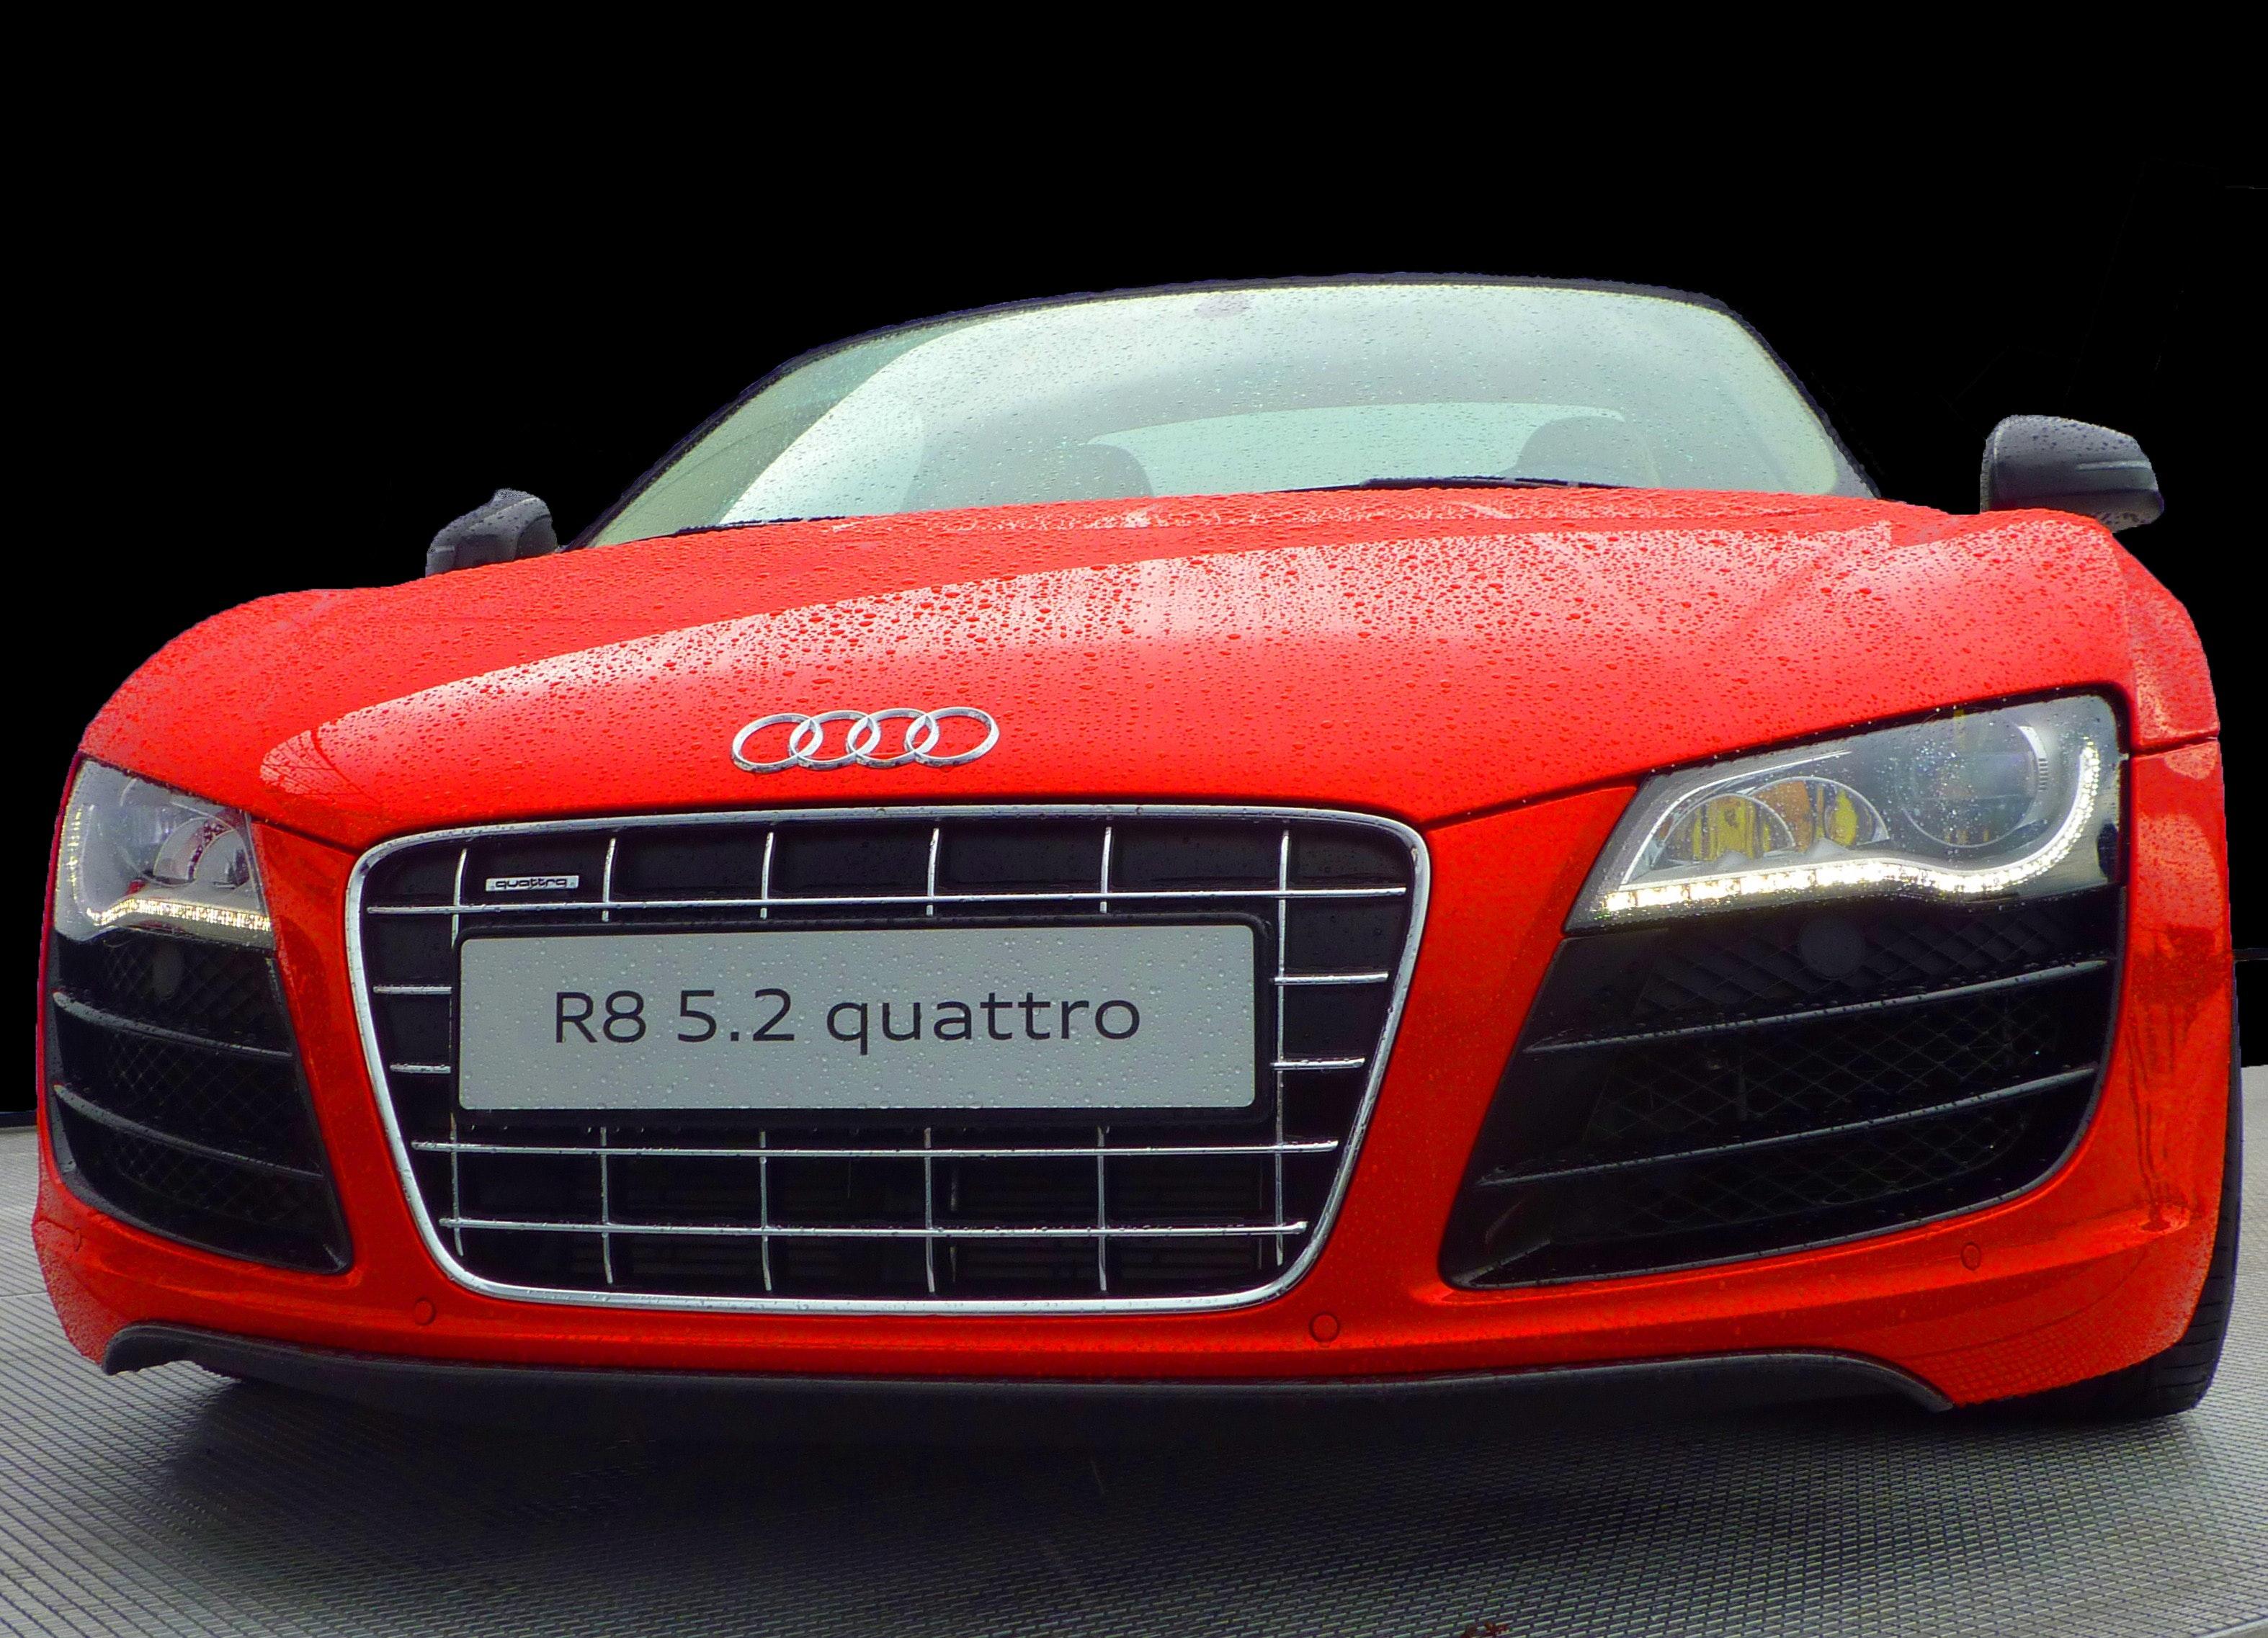 Red Audi R8 Quattro, Audi, Automobile, Bumper, Car, HQ Photo